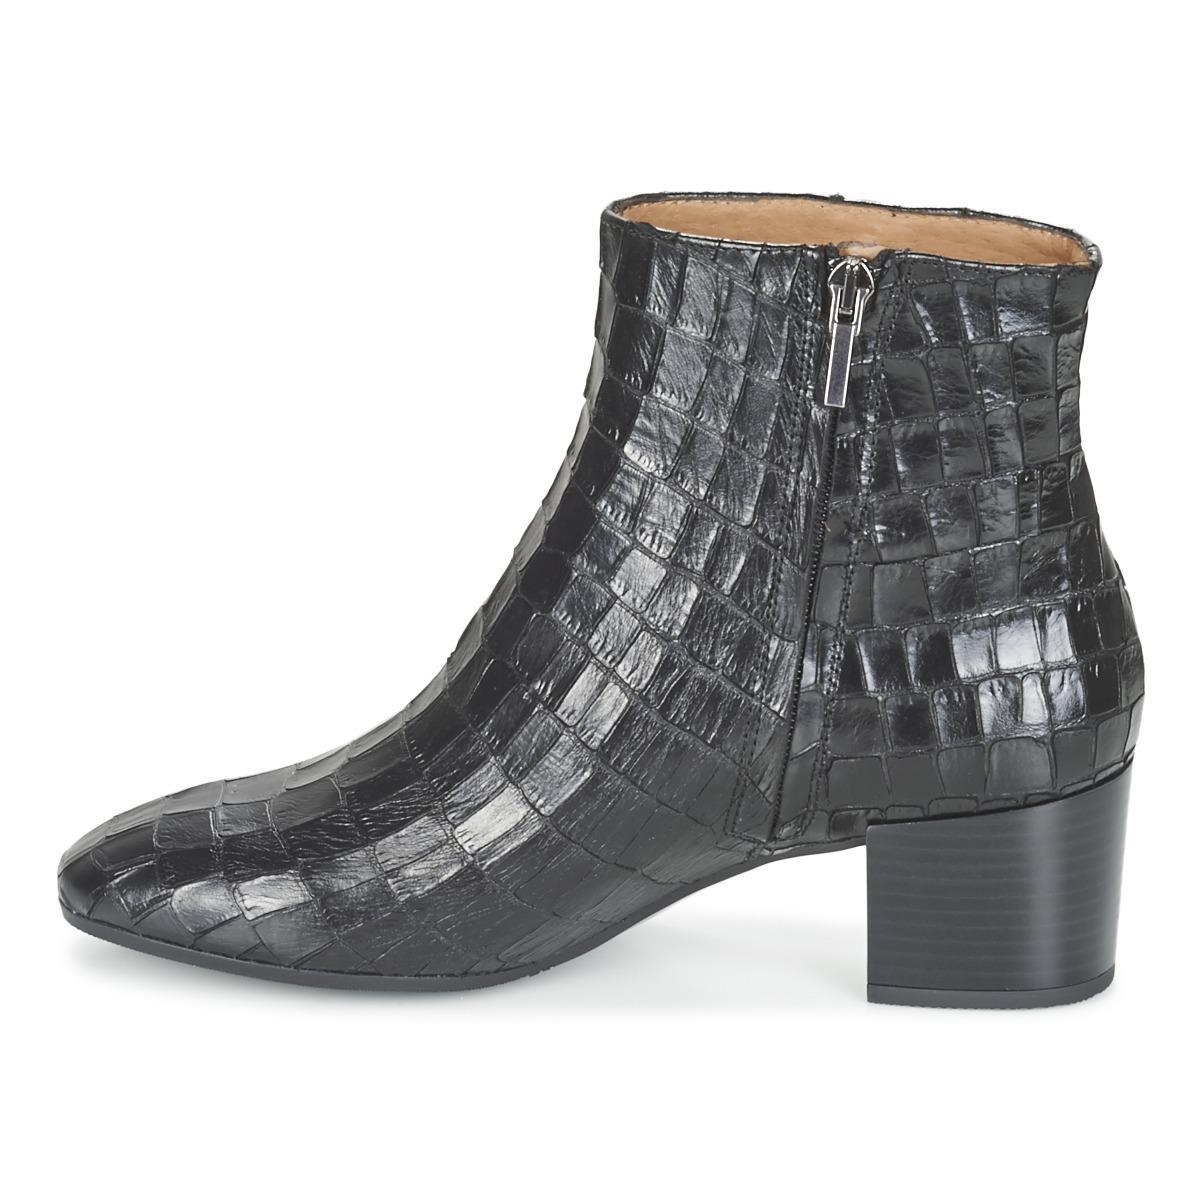 Fericelli Leather Fabiane Women's Low Ankle Boots In Black